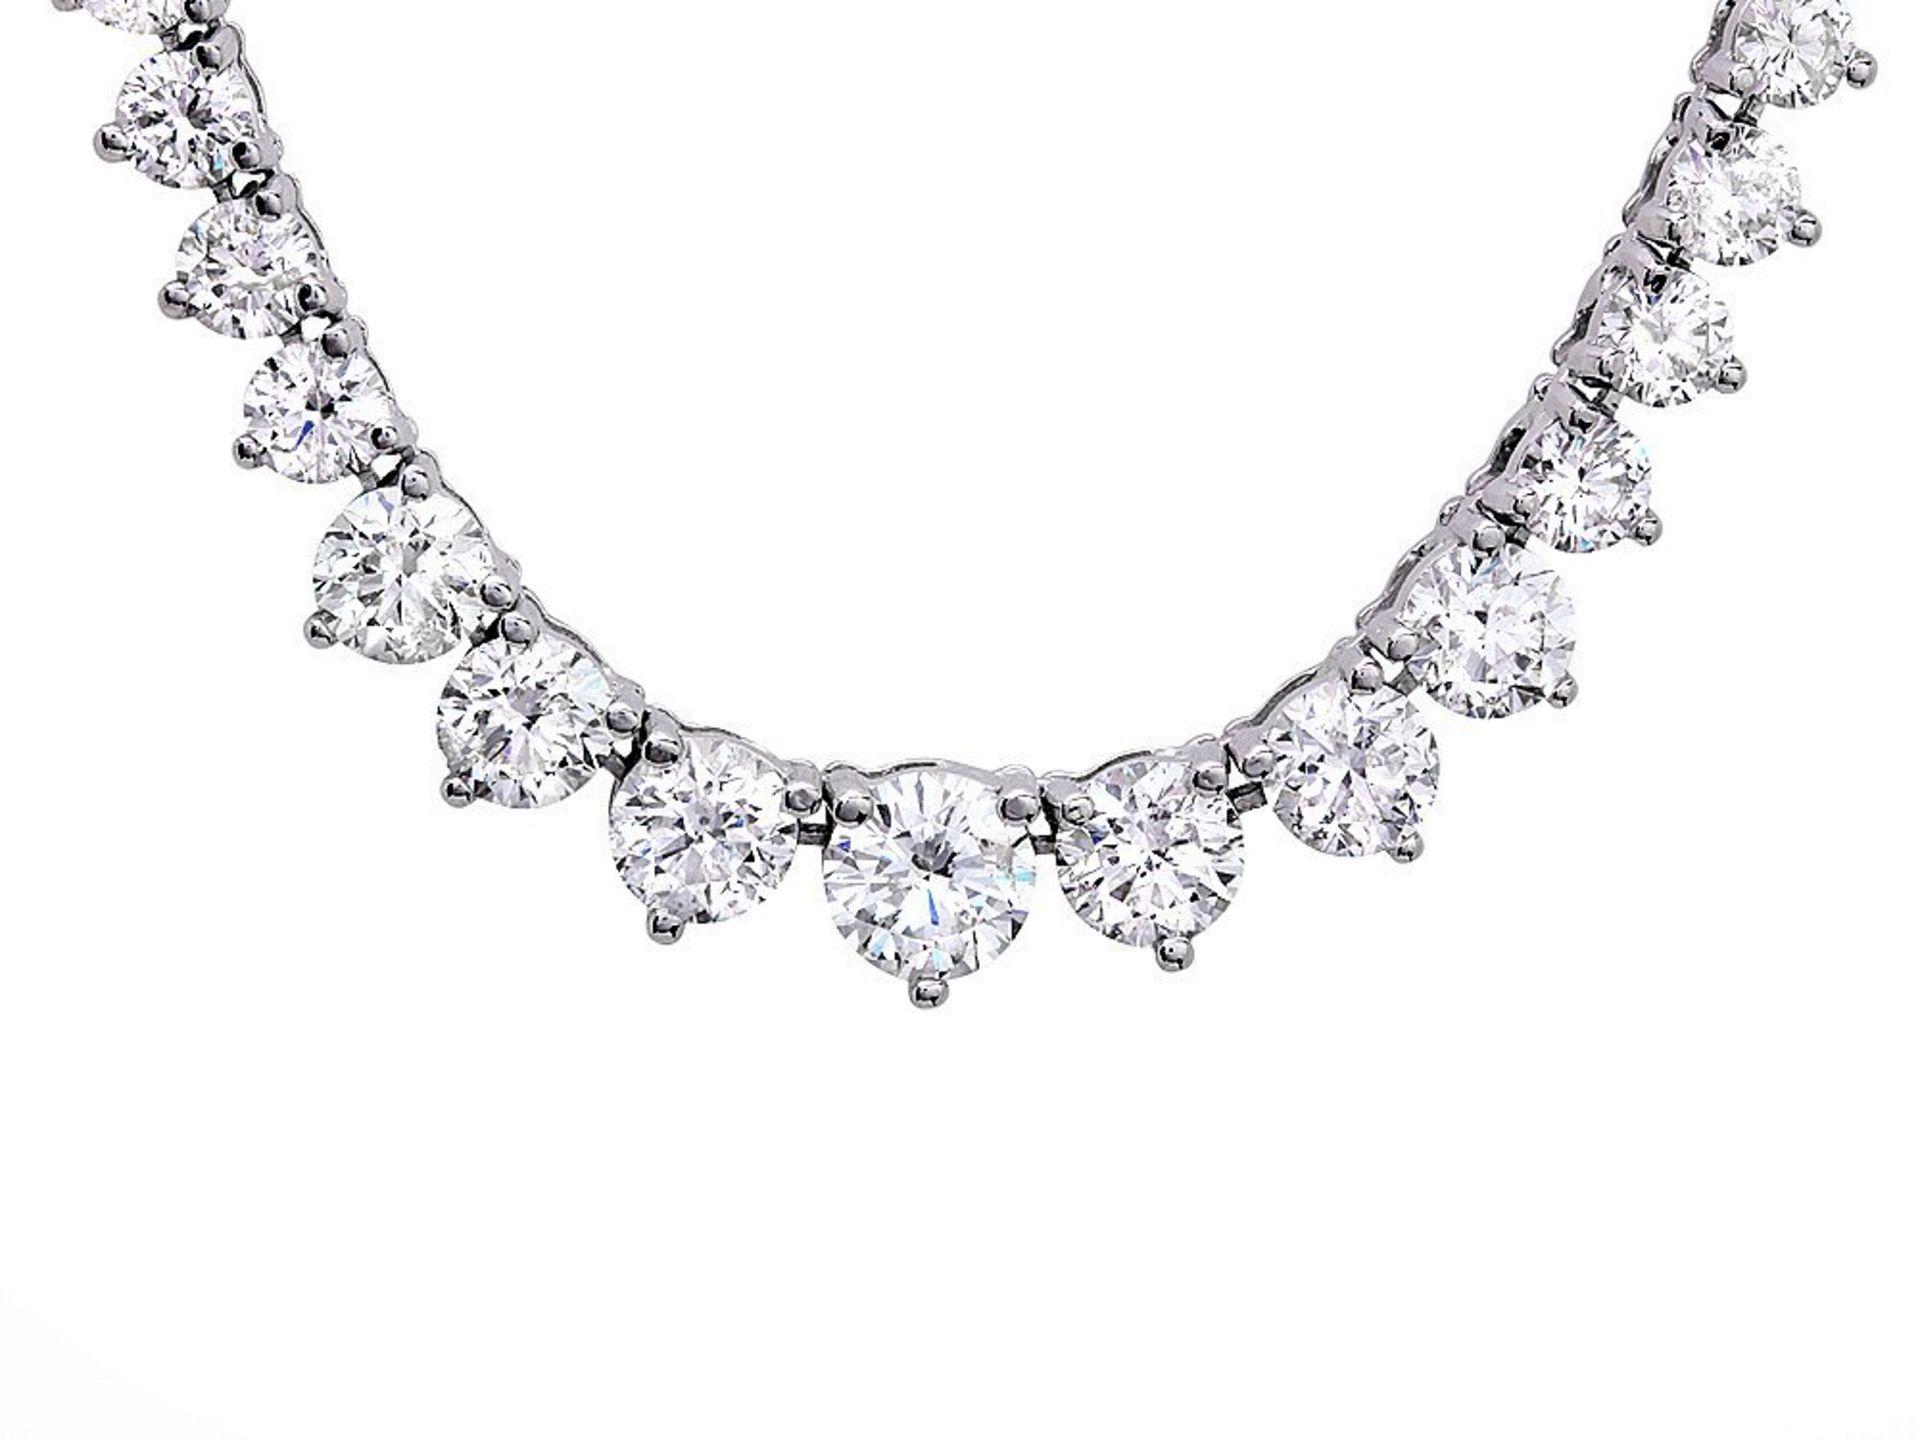 18k White Gold 9.00ct Diamond Necklace - Image 2 of 4